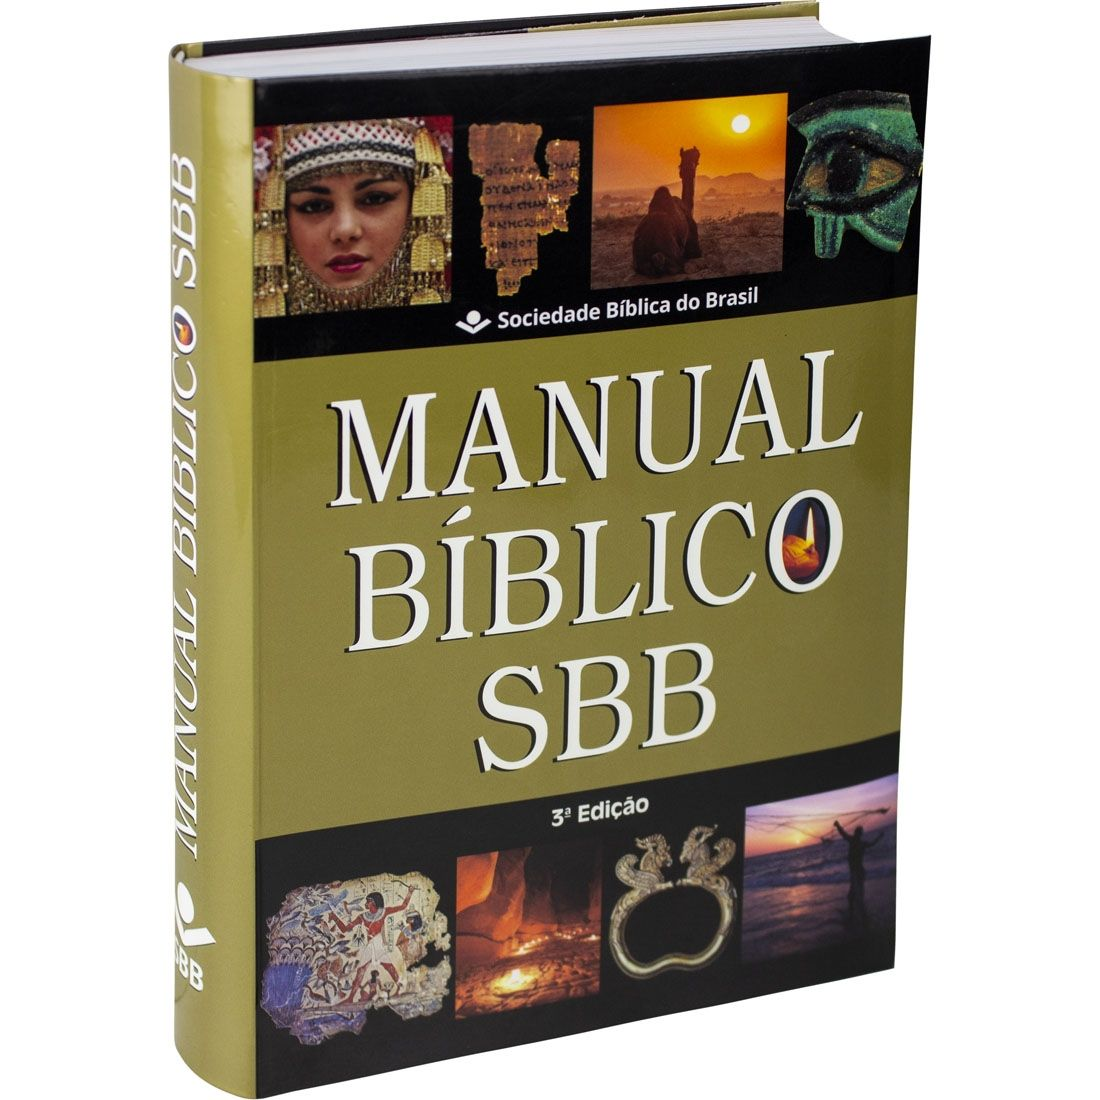 Kit Bíblia Sagrada Letra Gigante Índice Luxo Pink NTLH + Manual Bíblico SBB 3ª Edição